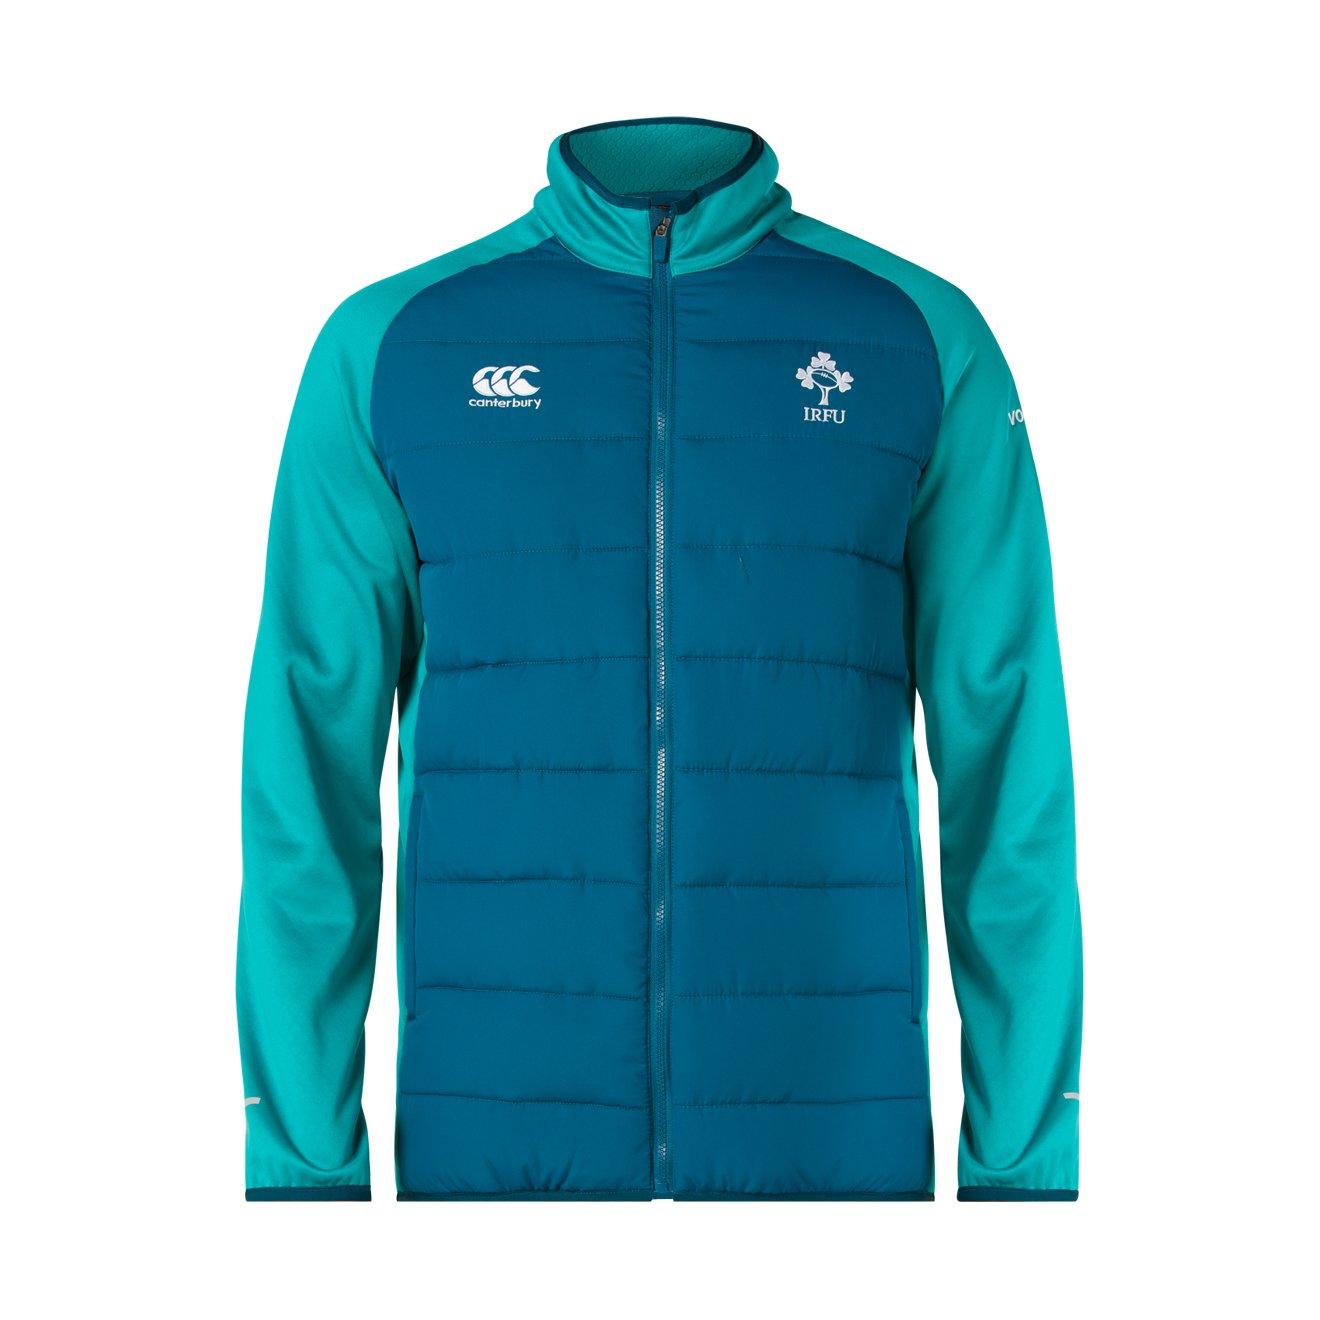 Canterbury - Chaqueta de Rugby híbrida para Hombre, diseño de Irlanda Oficial 18/19, Hombre, E583960L15, Moroccan Blue, X-Large